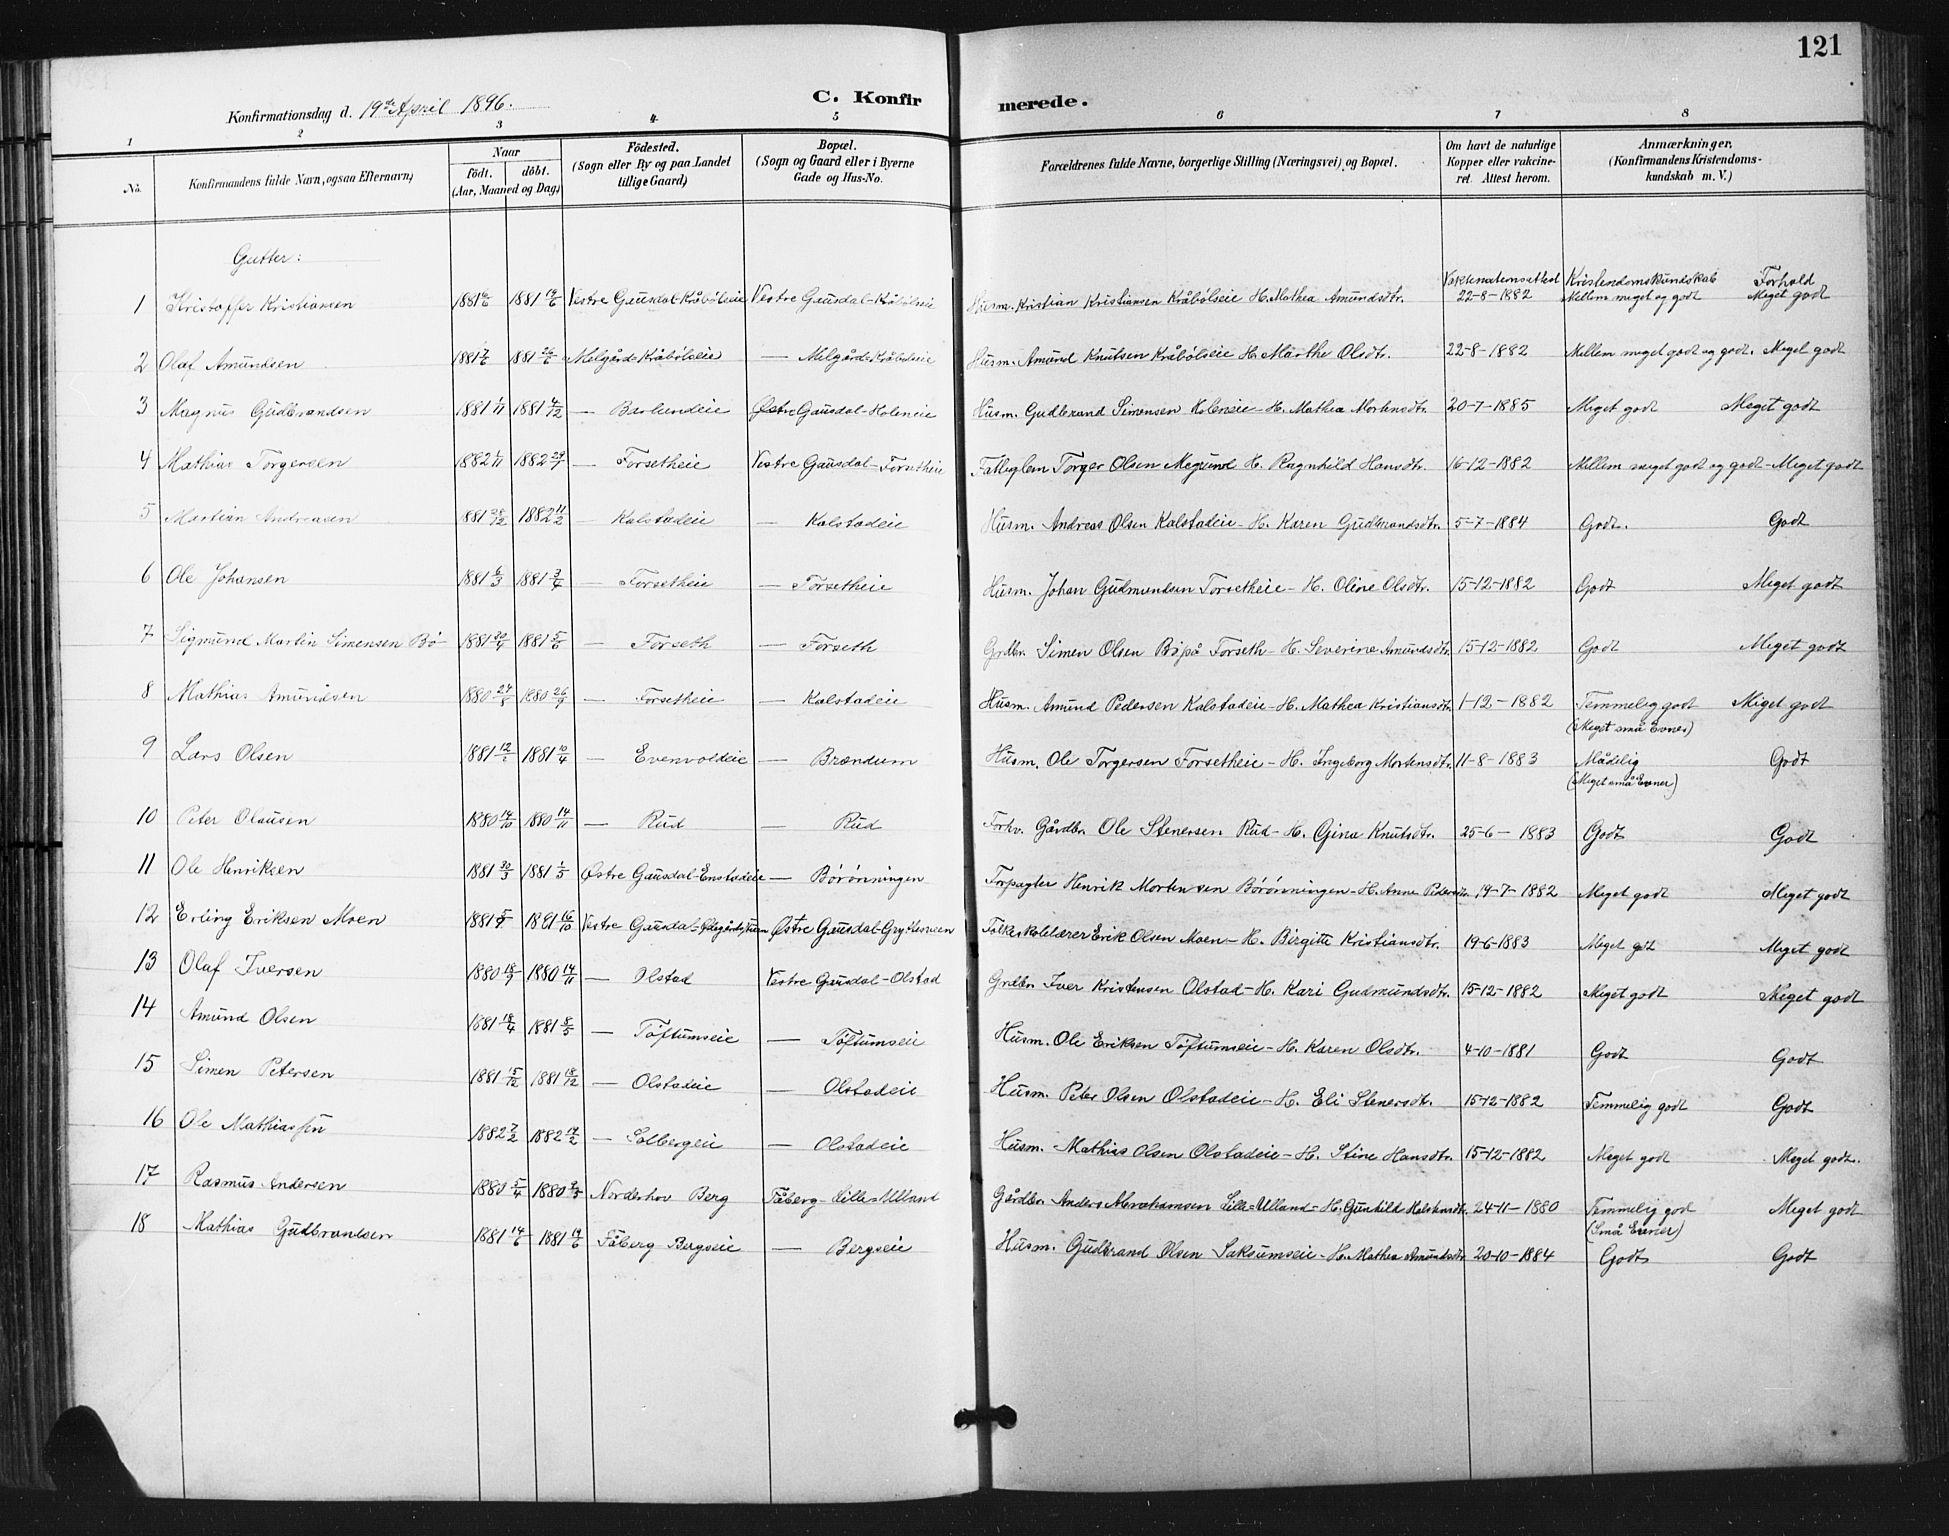 SAH, Vestre Gausdal prestekontor, Klokkerbok nr. 3, 1896-1925, s. 121